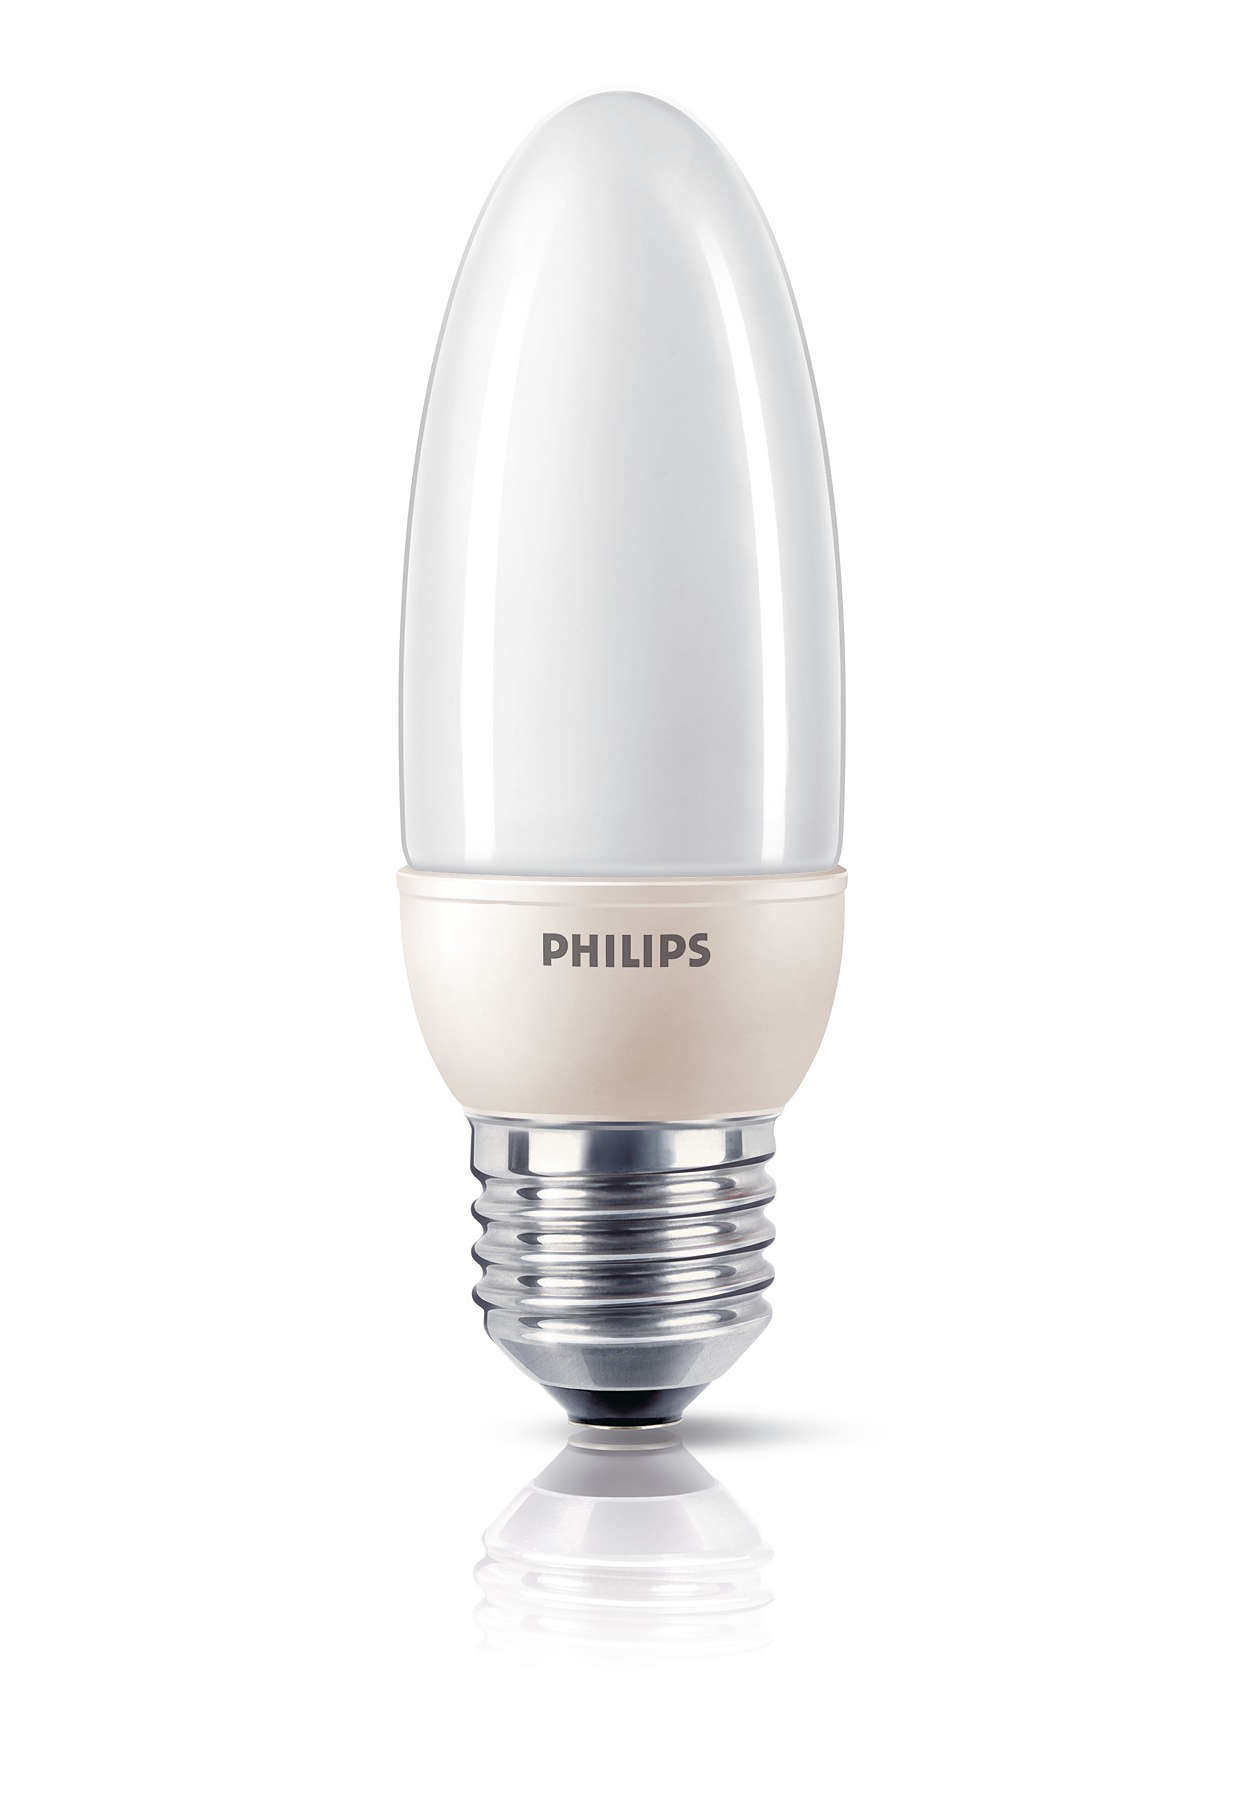 Energiesparendes Licht in Kerzenform